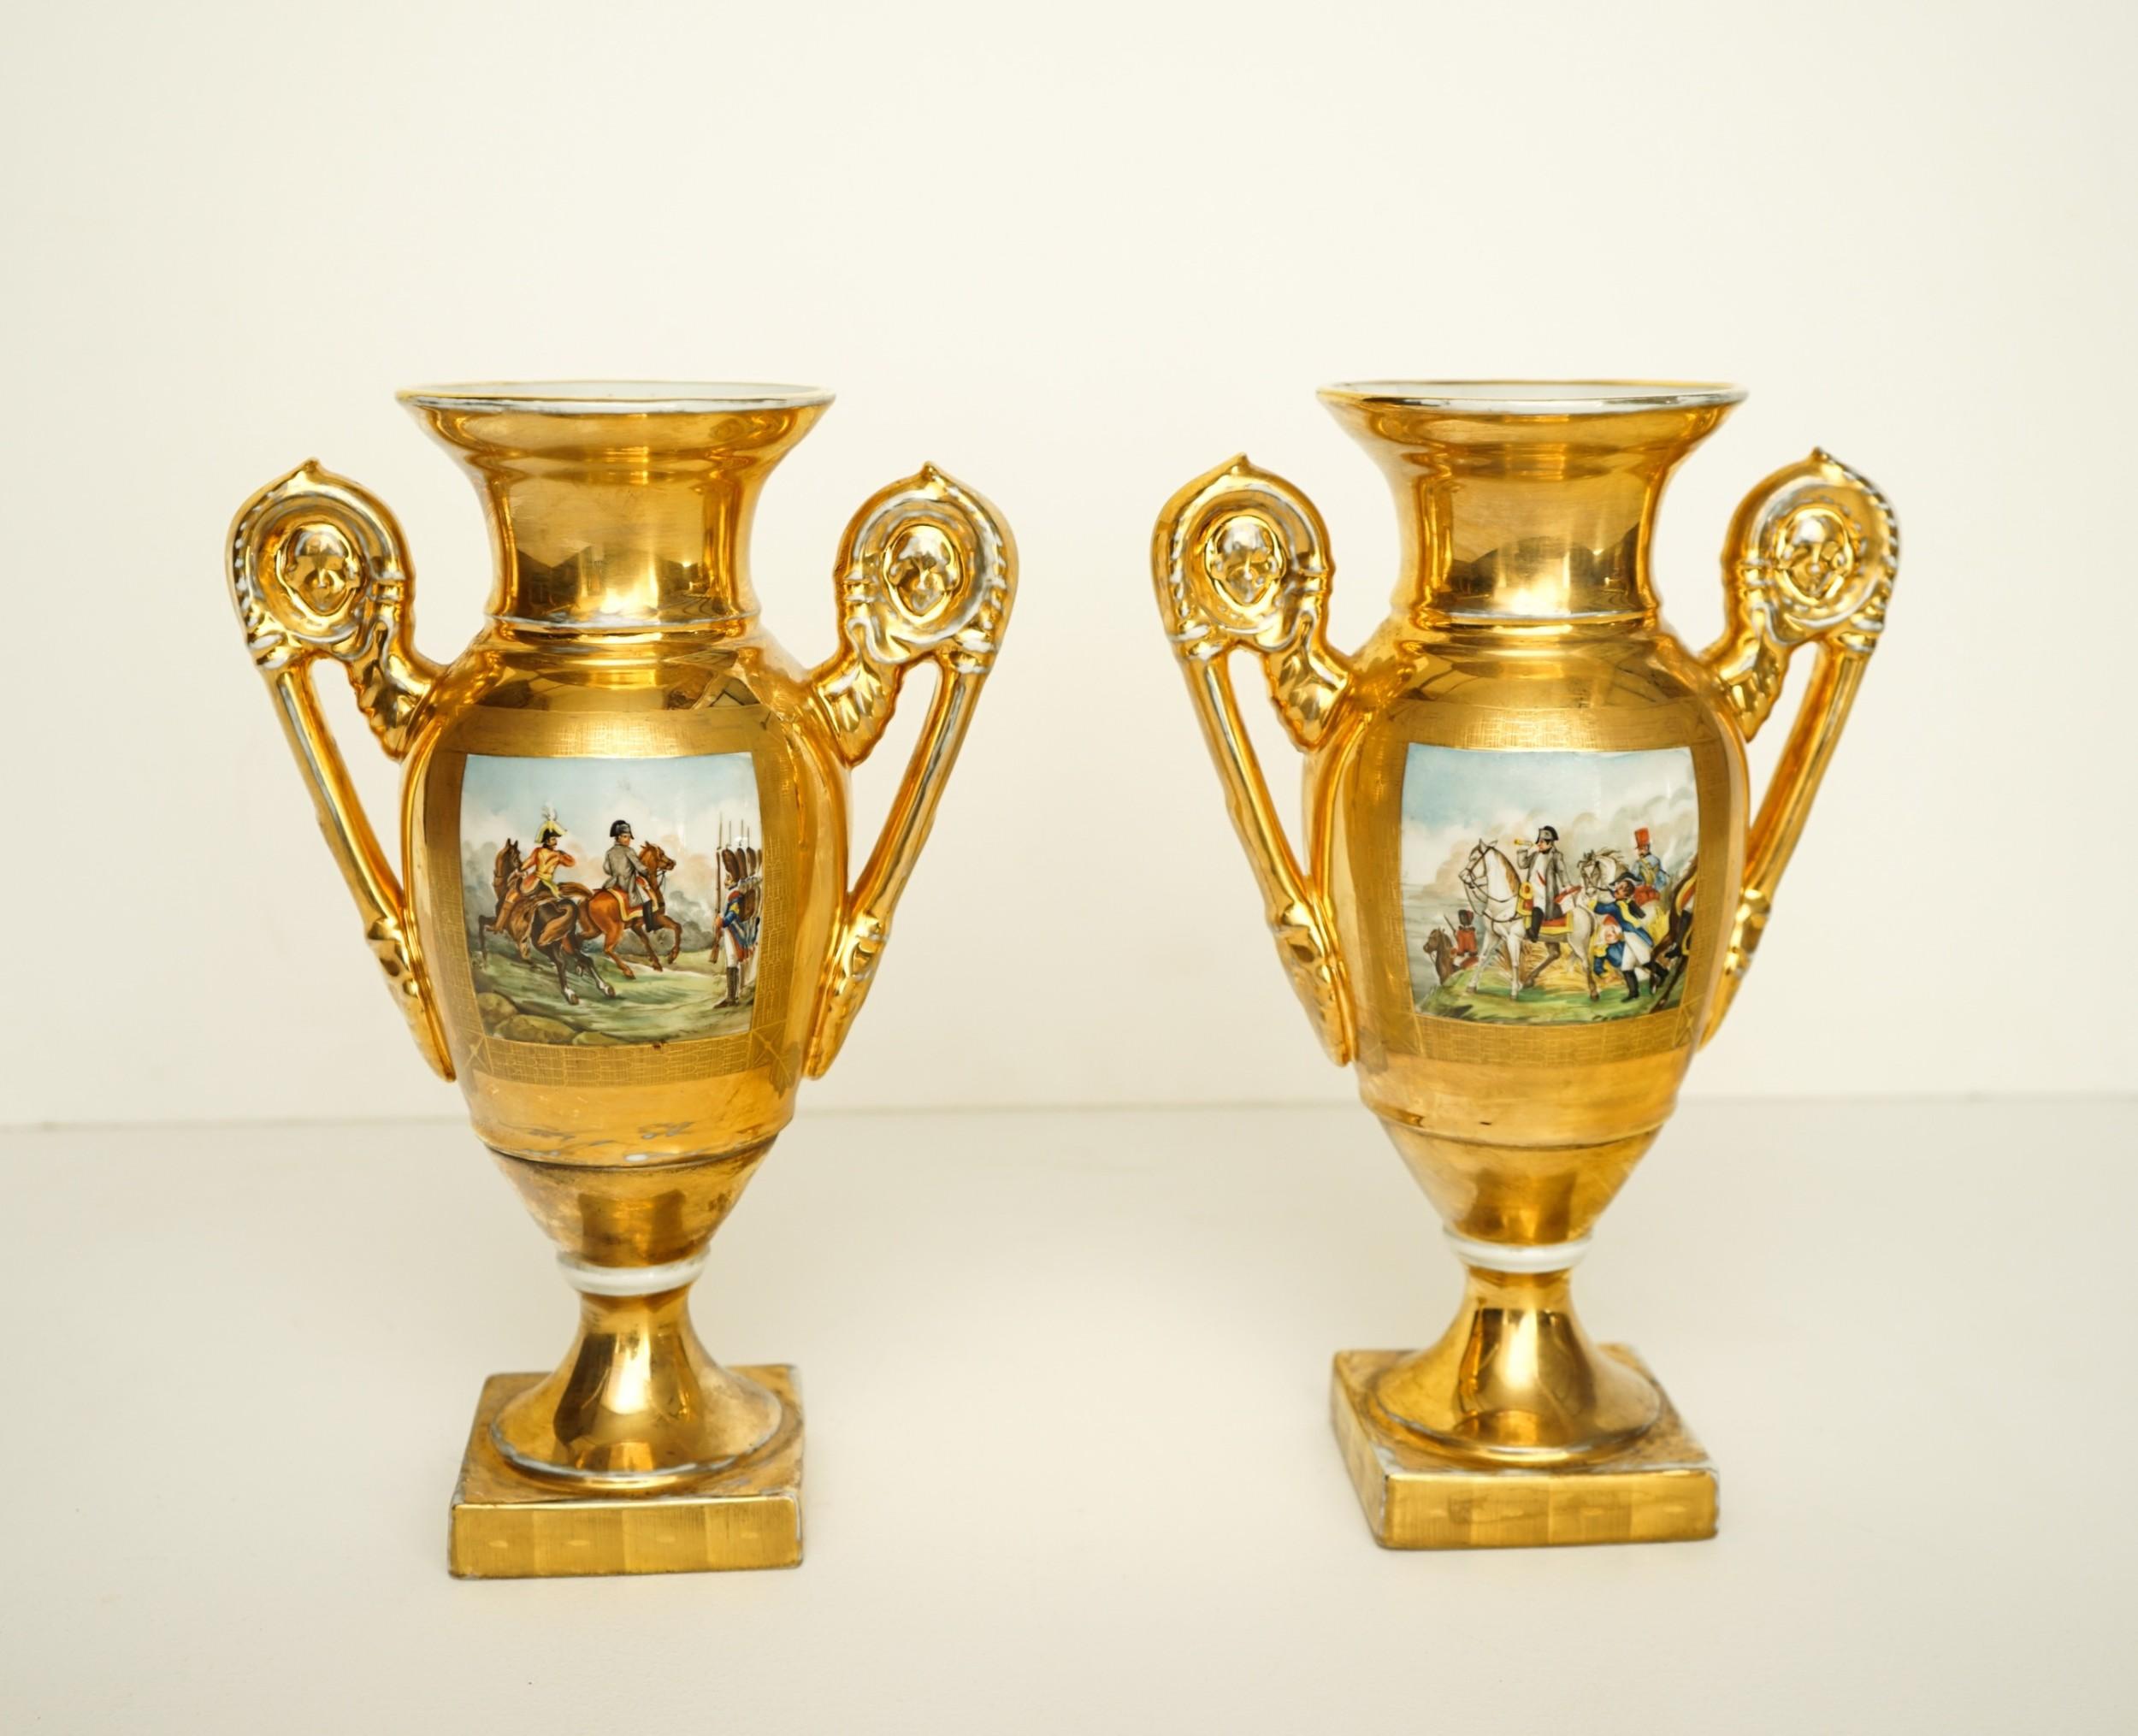 pair of paris porcelain vases depicting napoleon on a gold ground